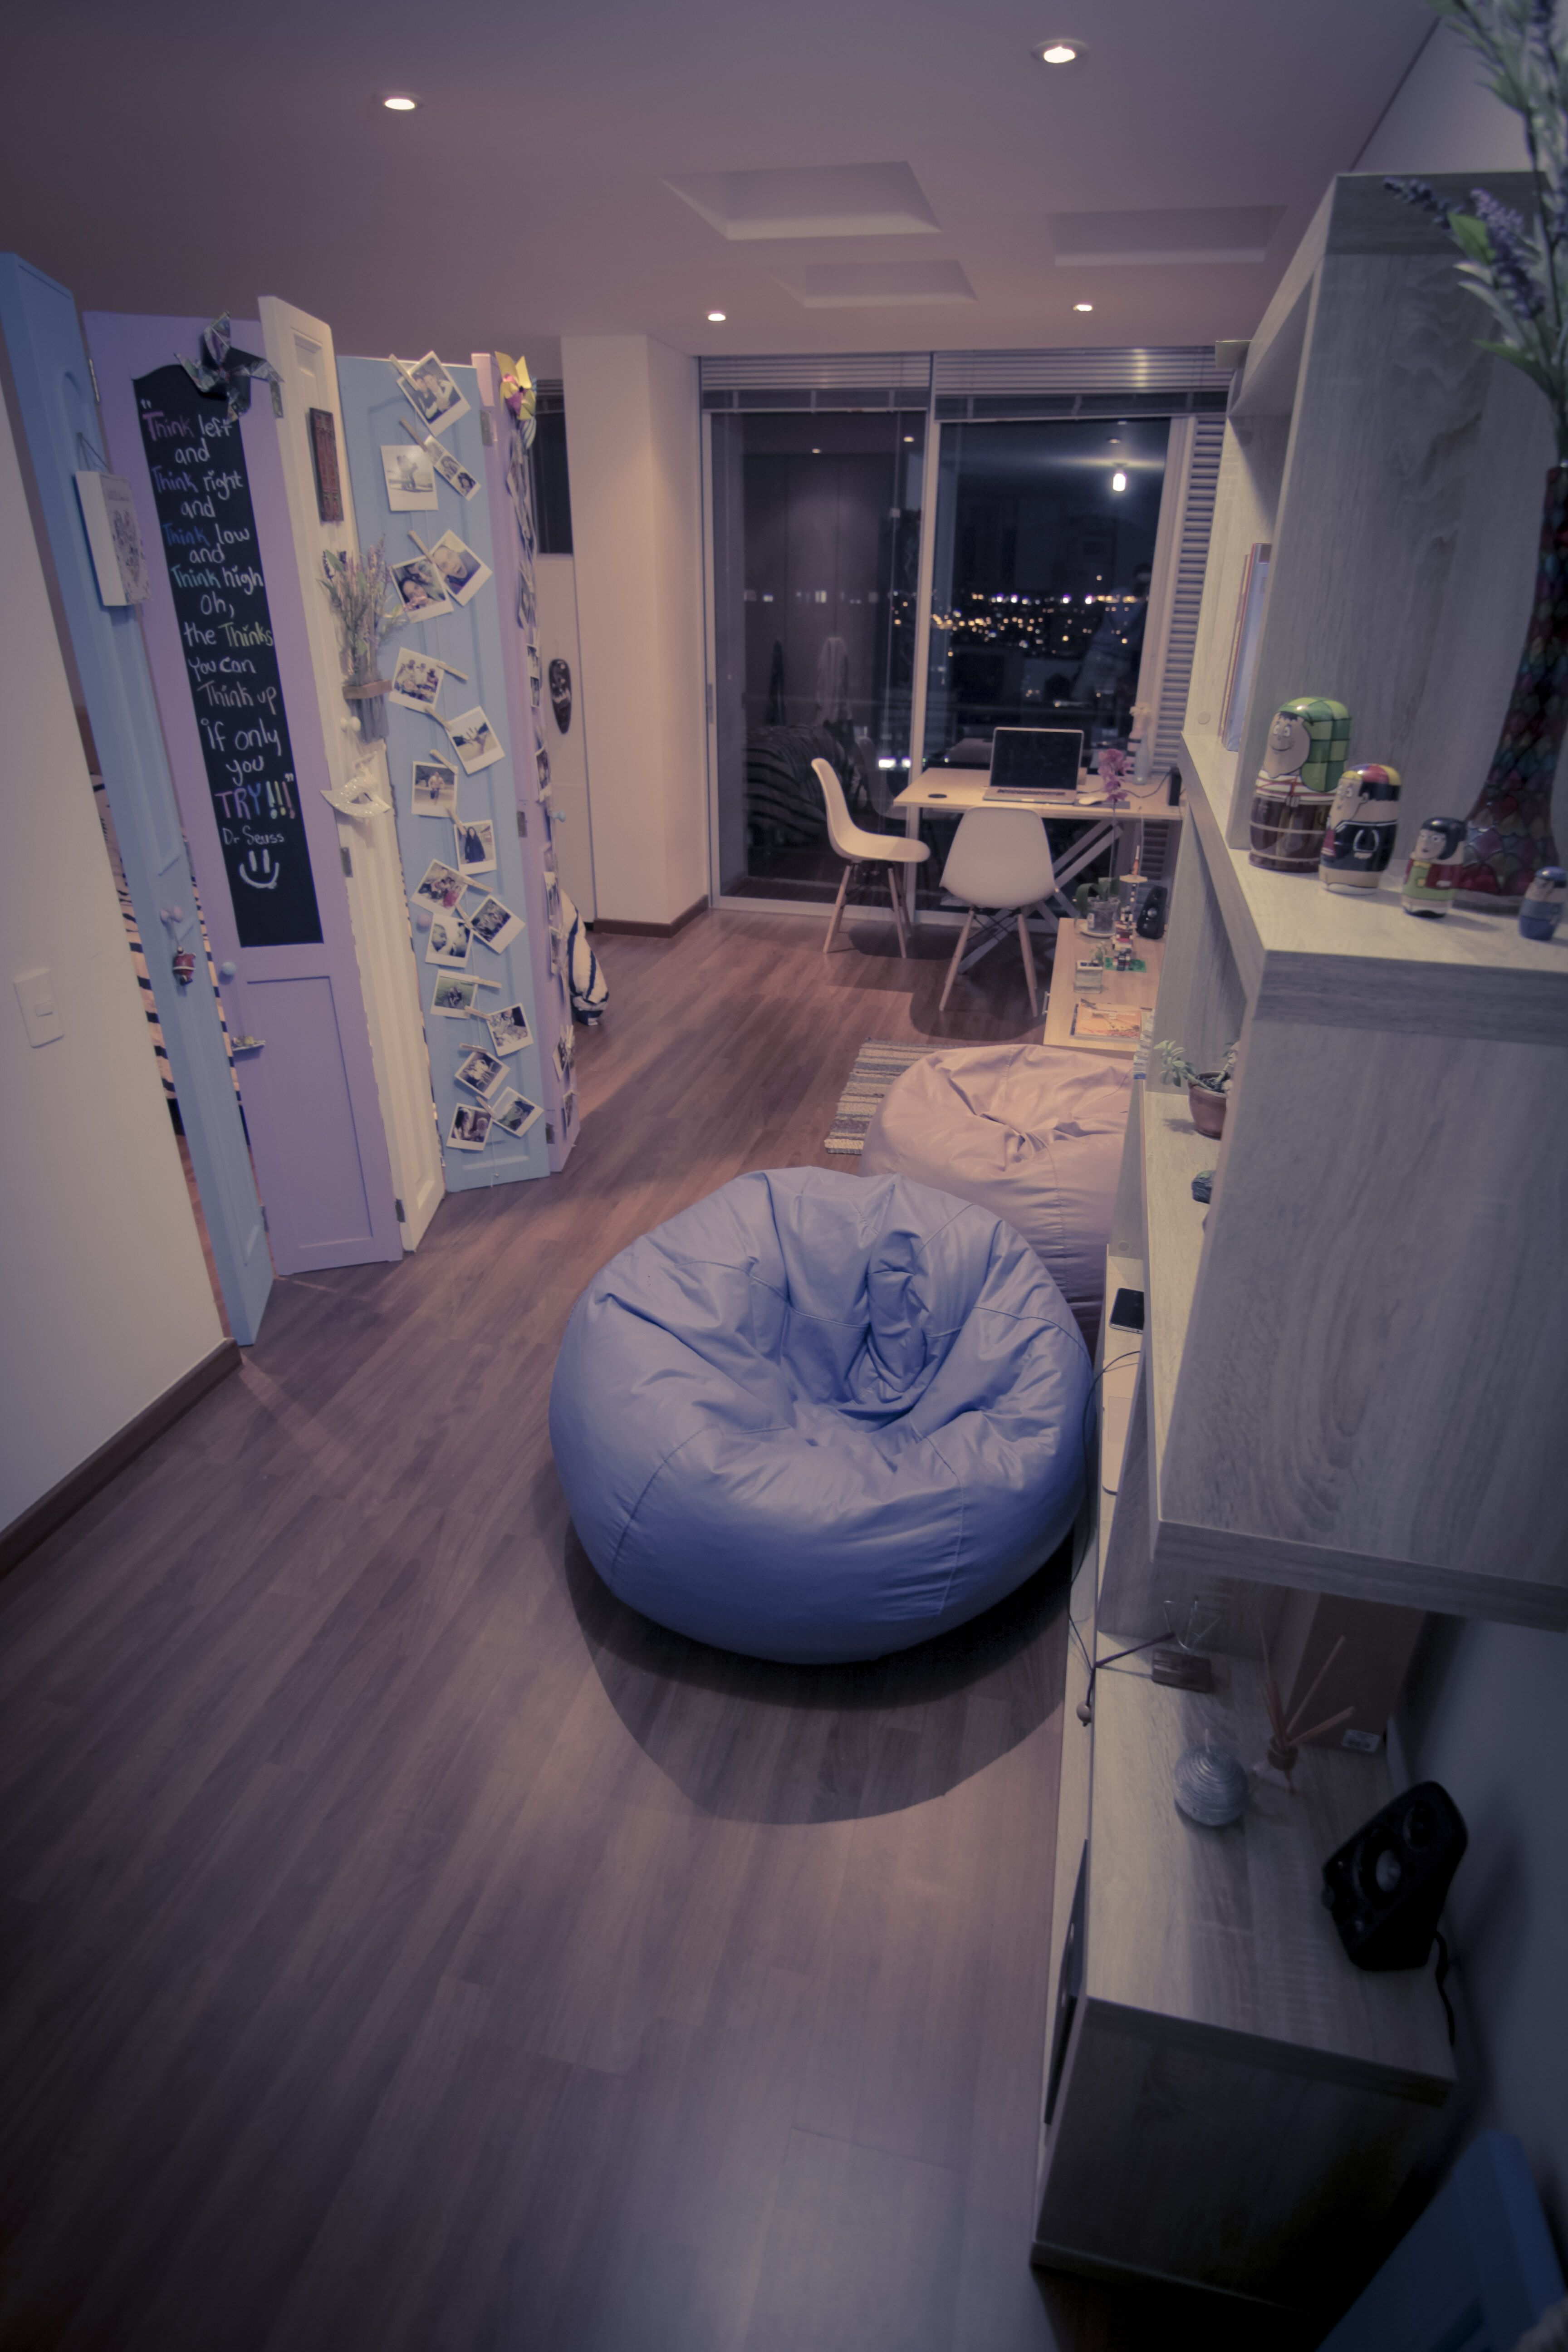 Thats how it looks my diy biombo in my little flat